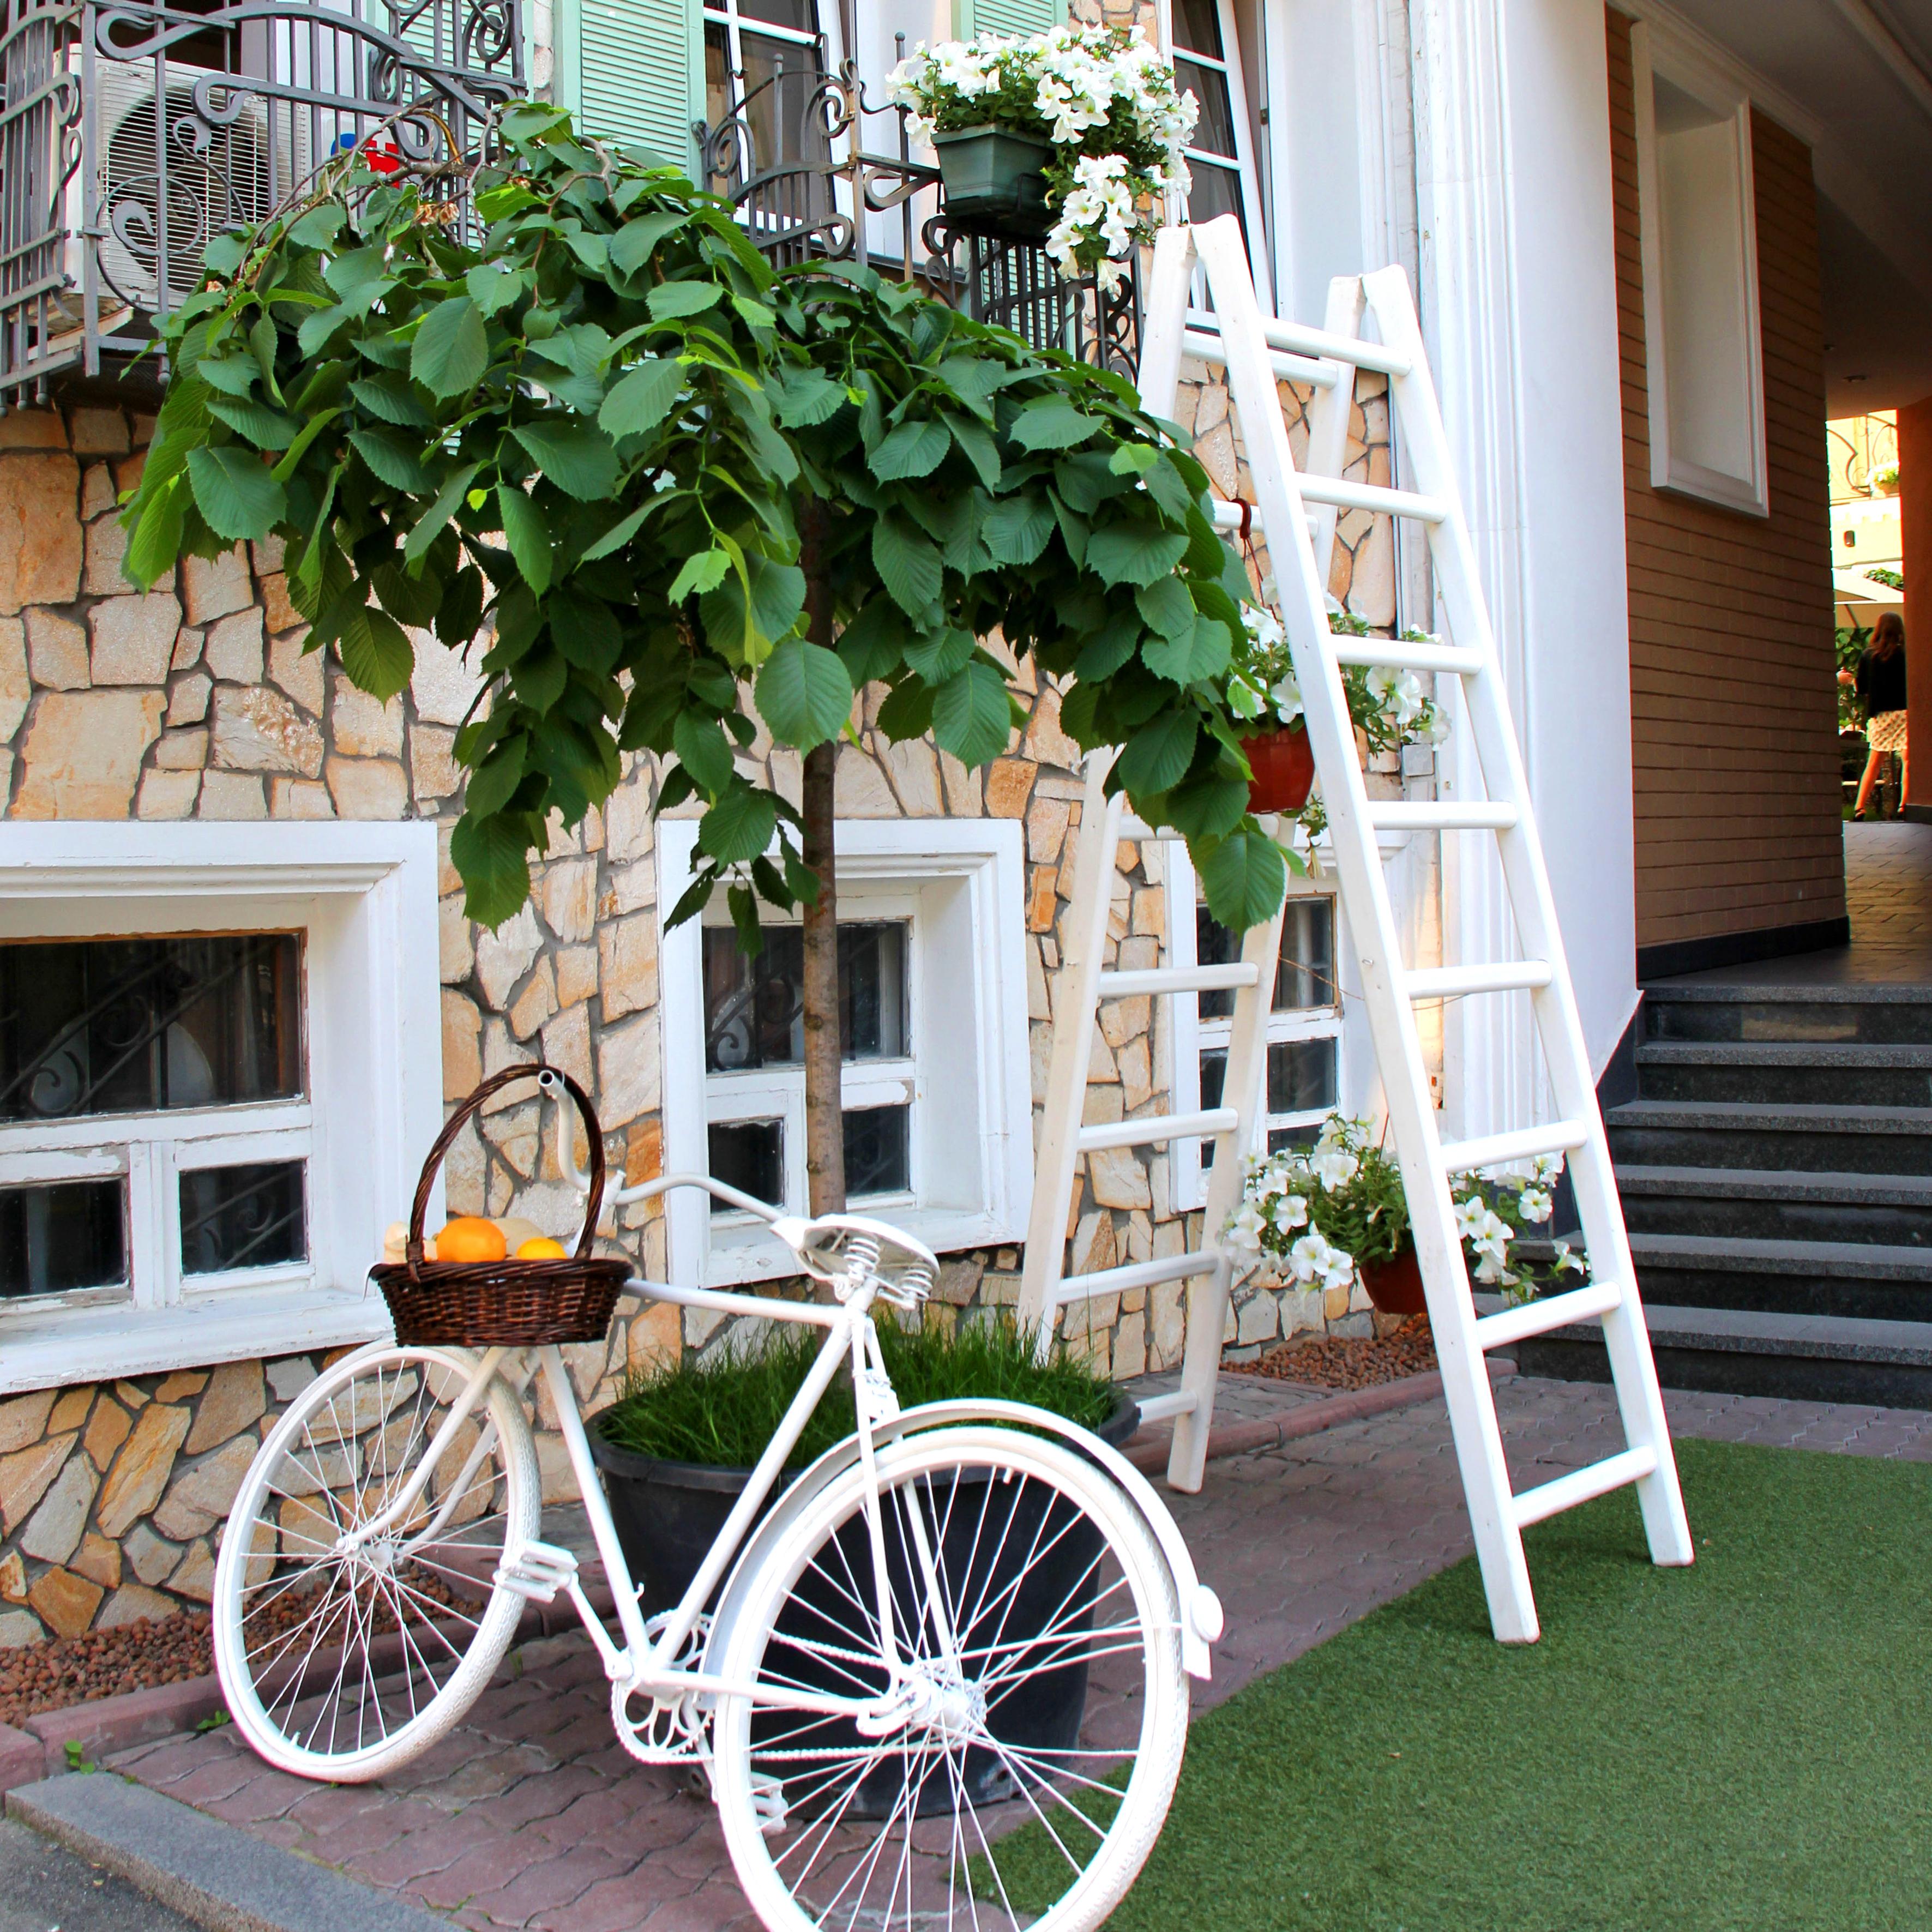 Fotos gratis : árbol, césped, arquitectura, madera, rueda, casa ...